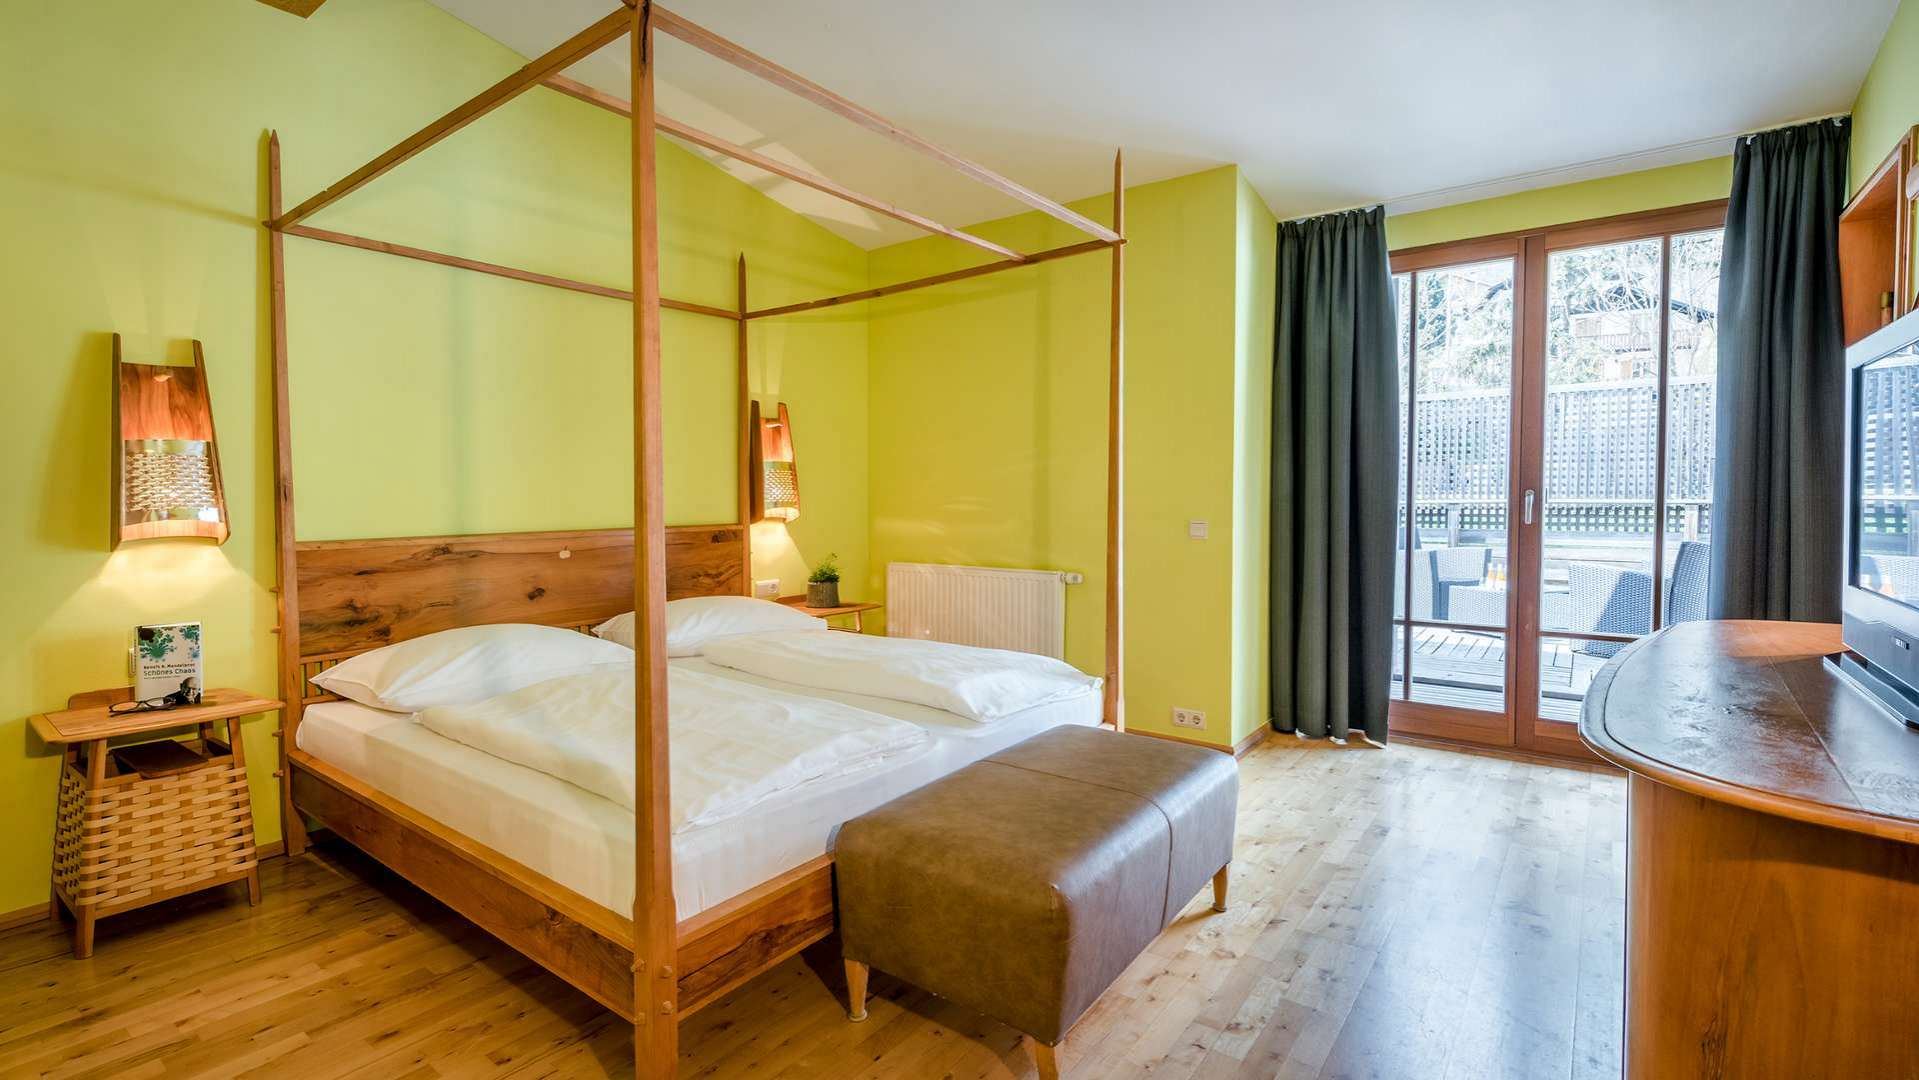 Camera Con Cabina Armadio E Bagno.Hotel Botango B B Parcines Merano Suite Classic Balcony